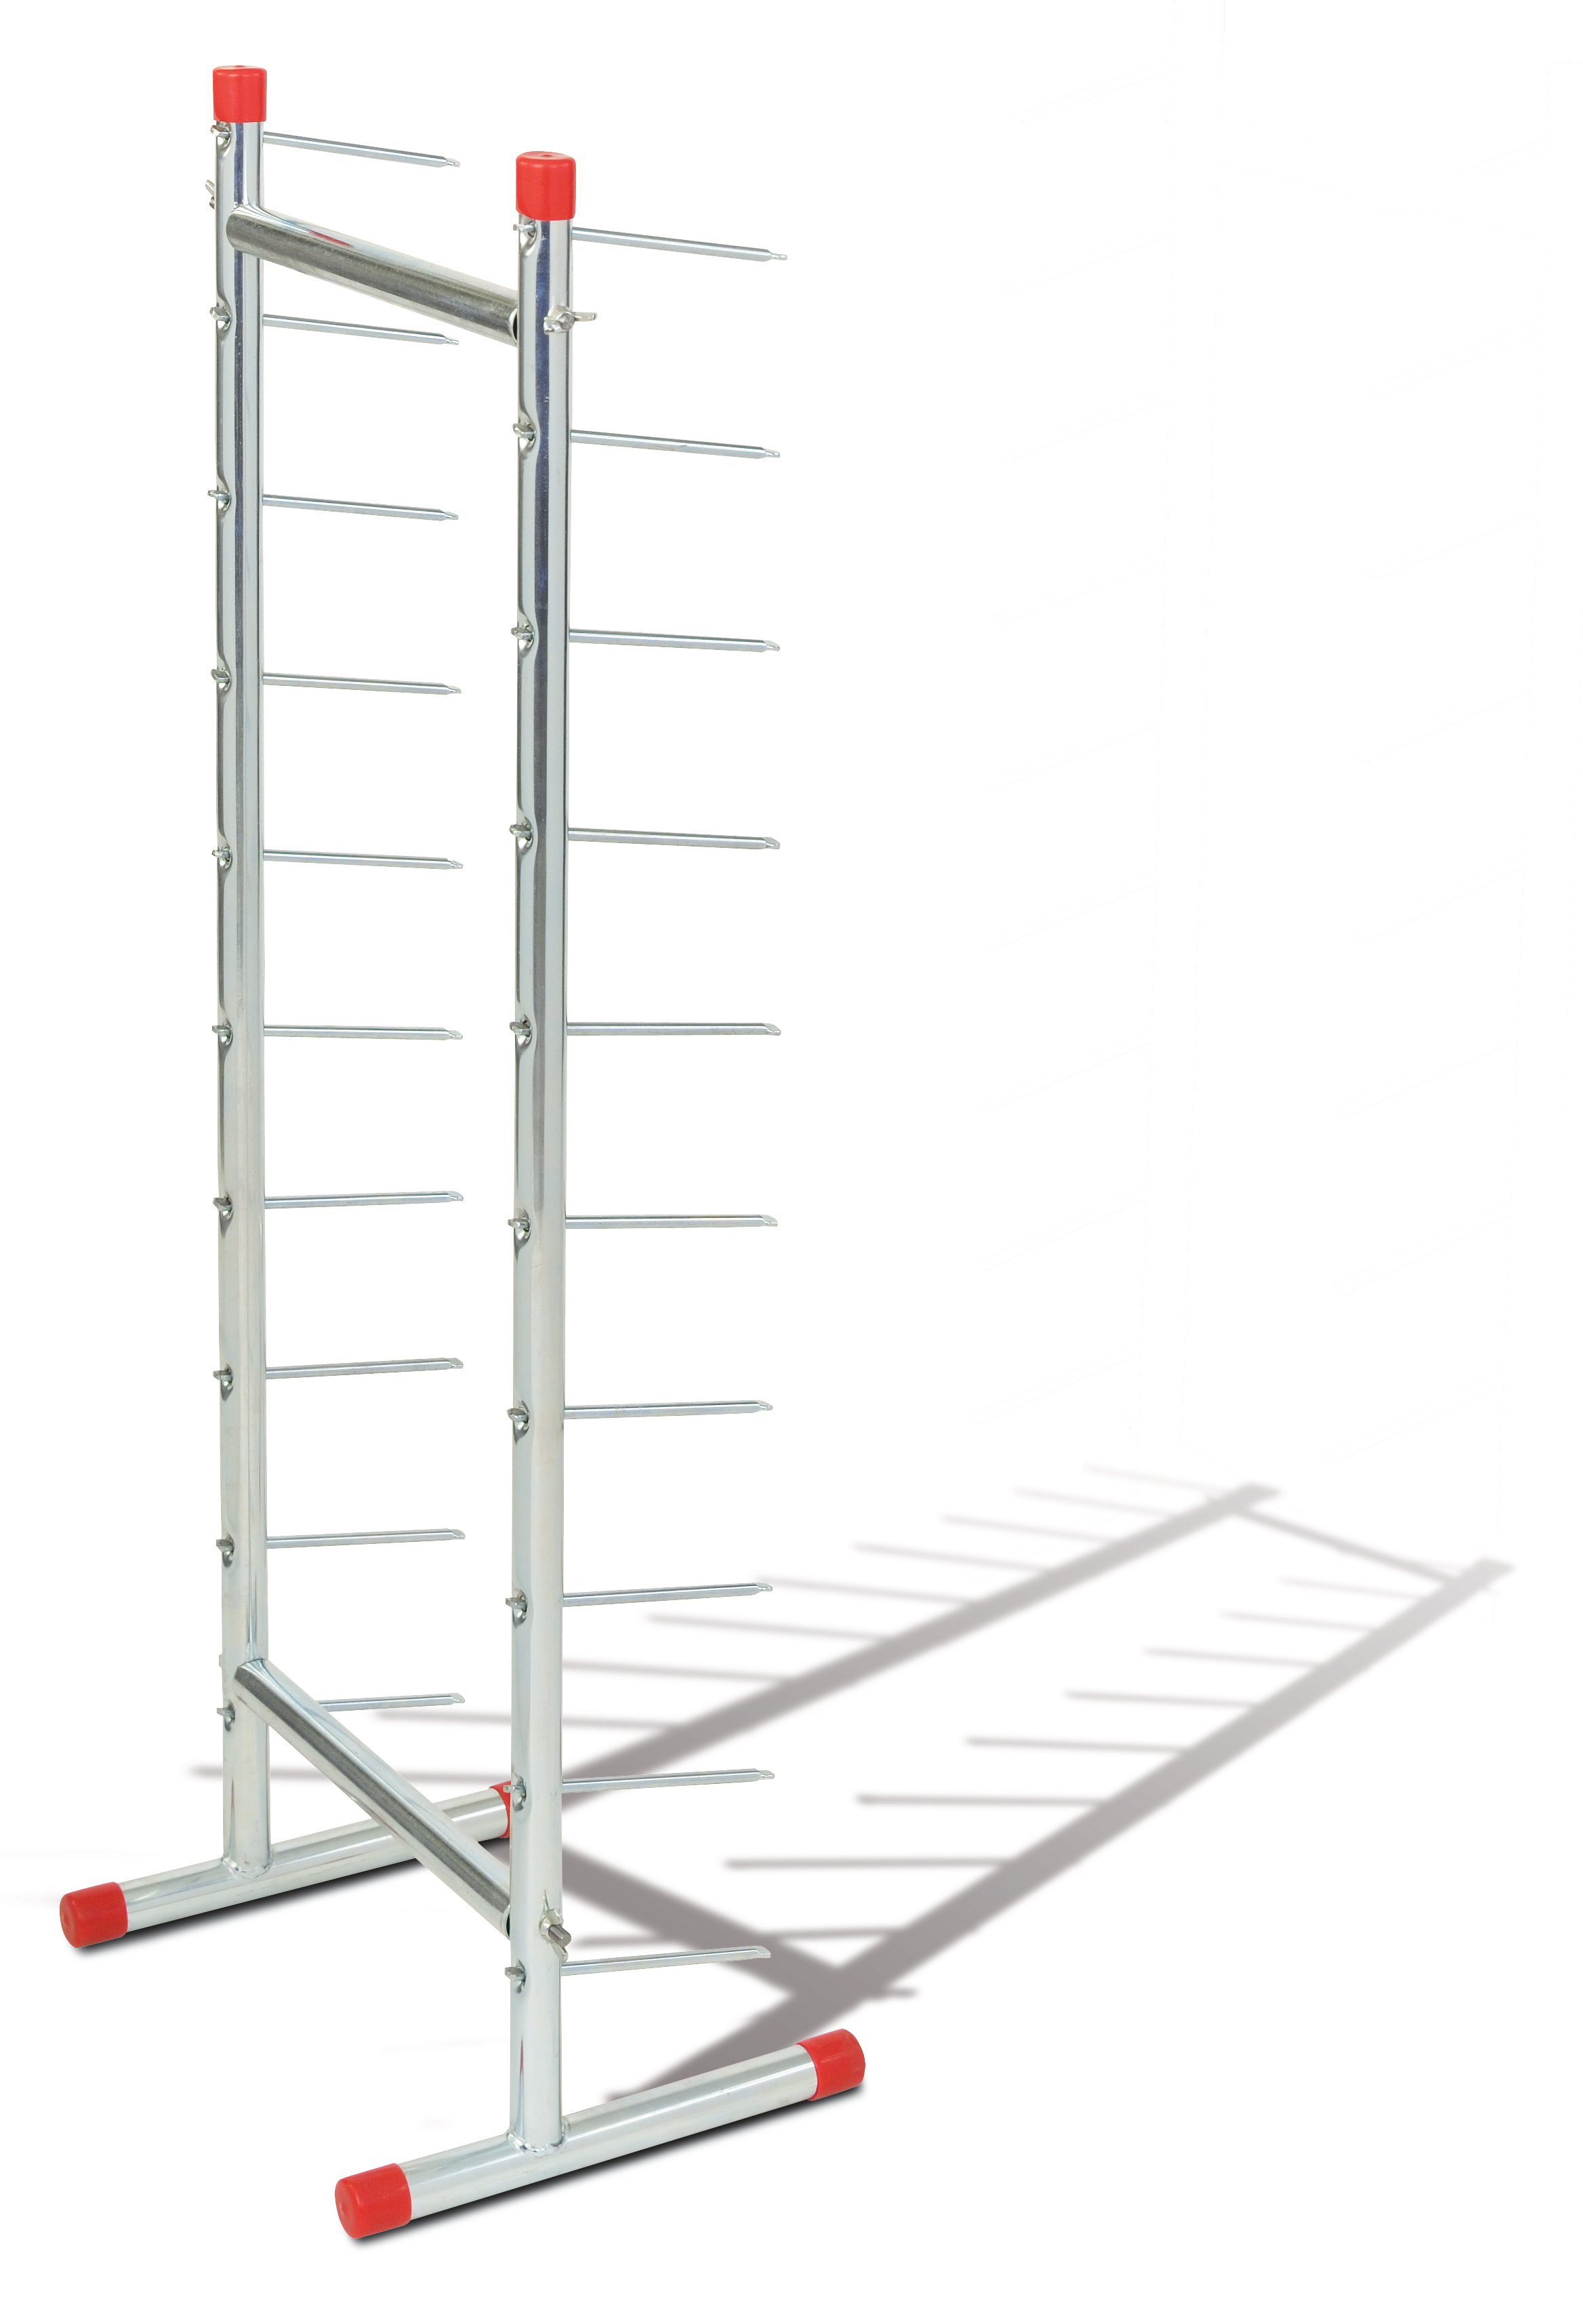 Drying rack Pajarito